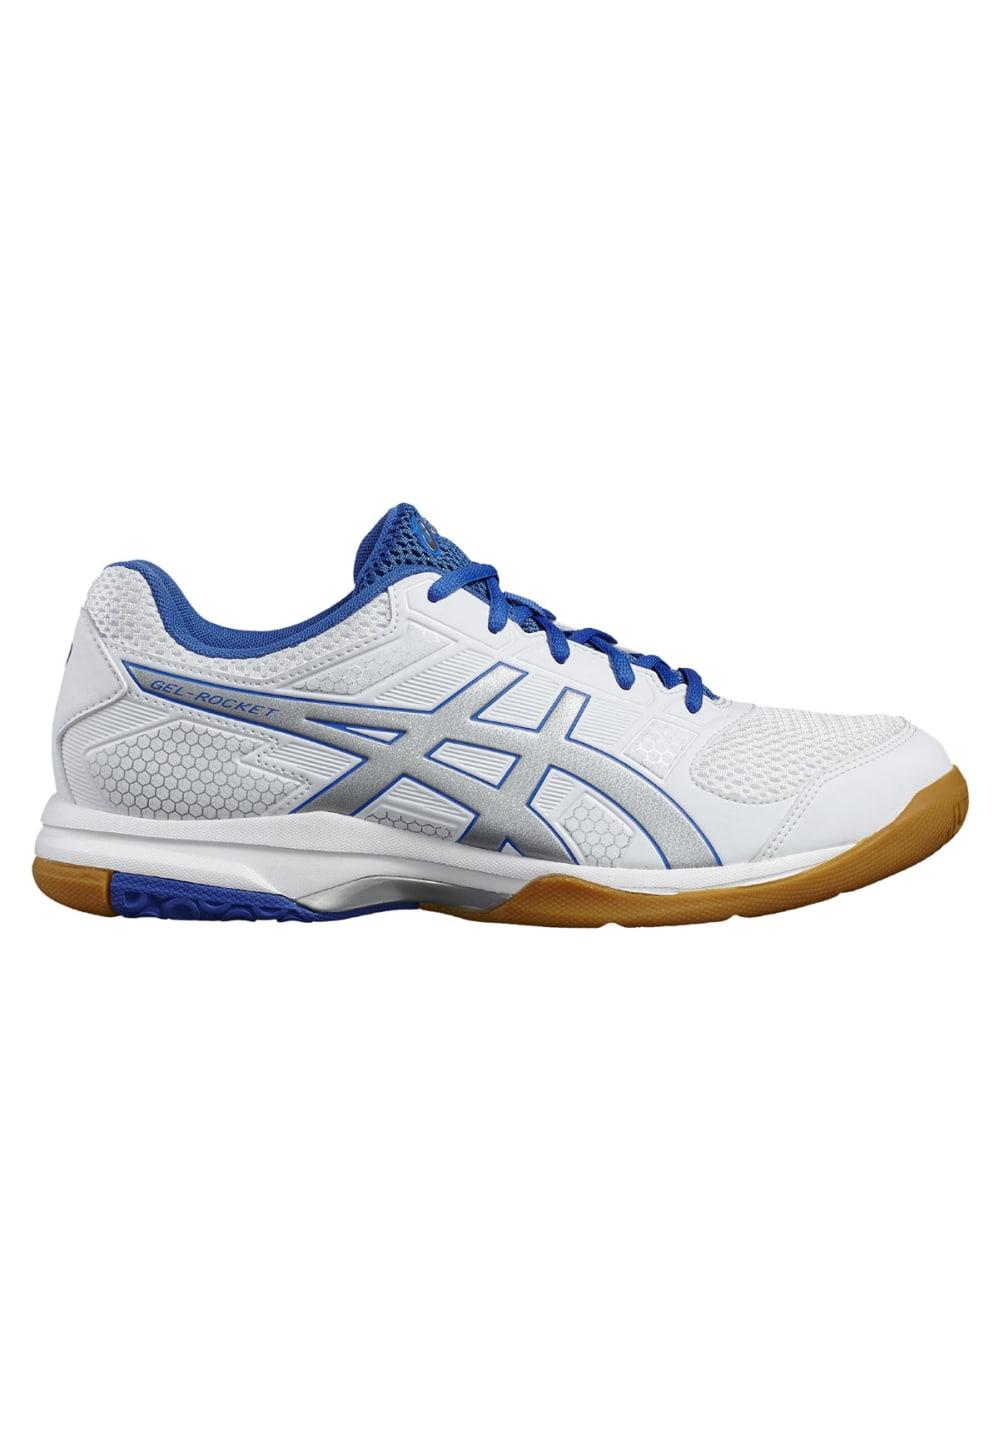 asics gel-rocket 8 chaussures de volleyball homme blanc